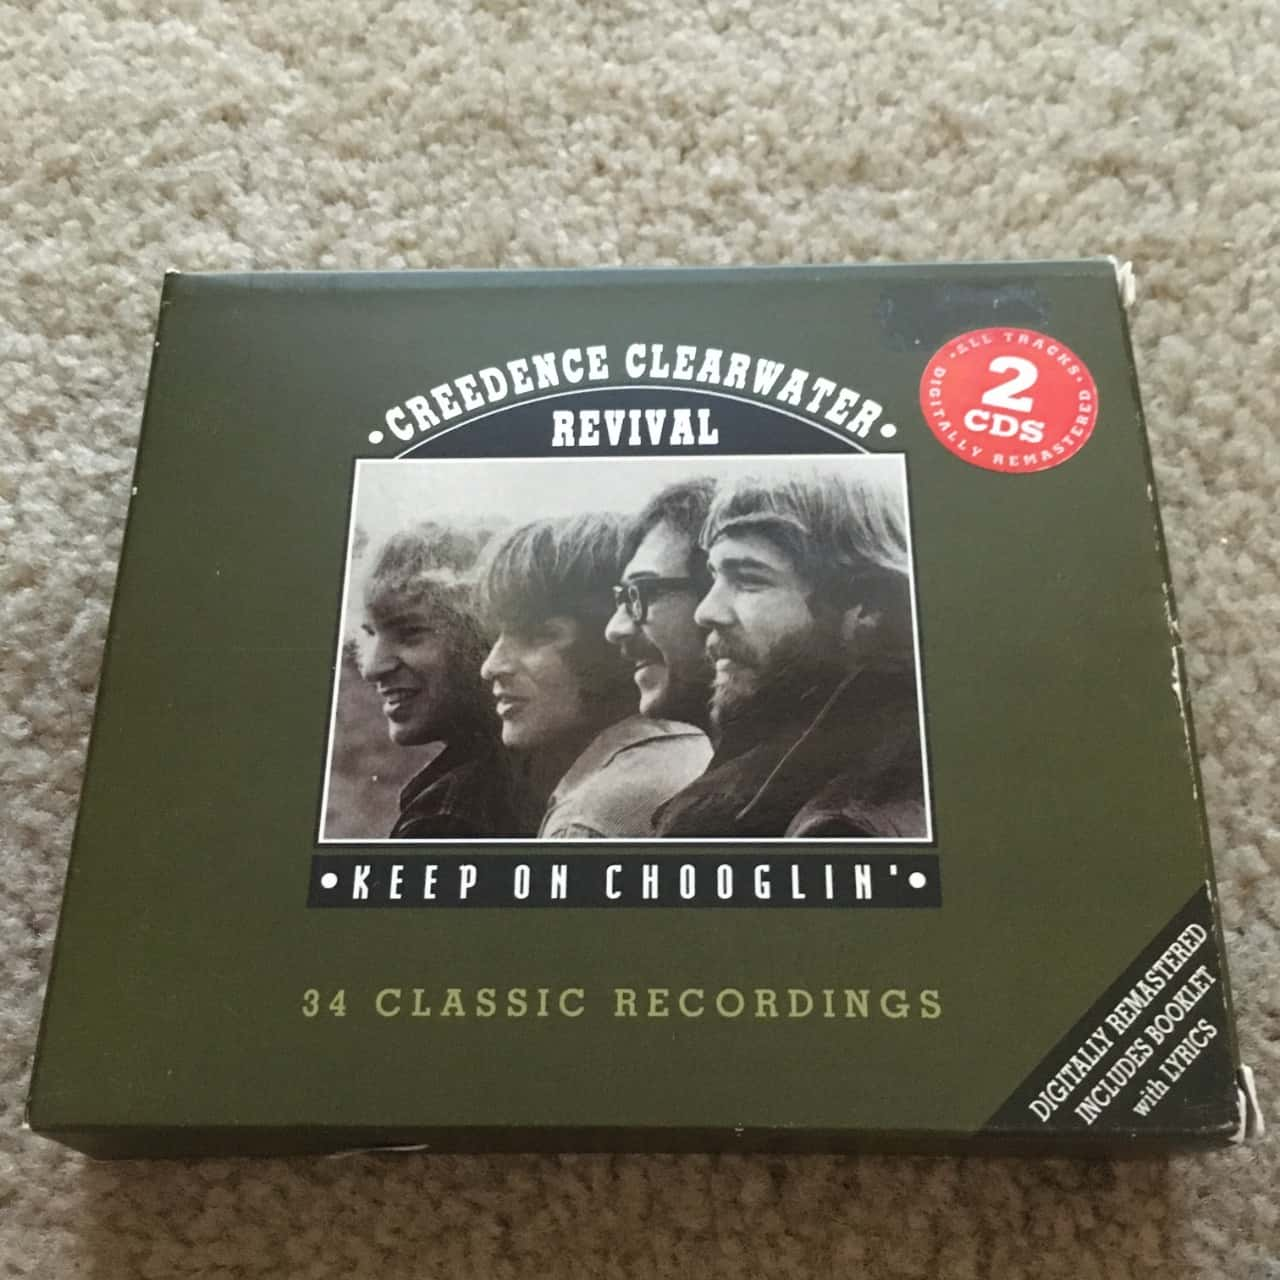 Creedence Clearwater Revival - Keep on Chooglin  2 CDs